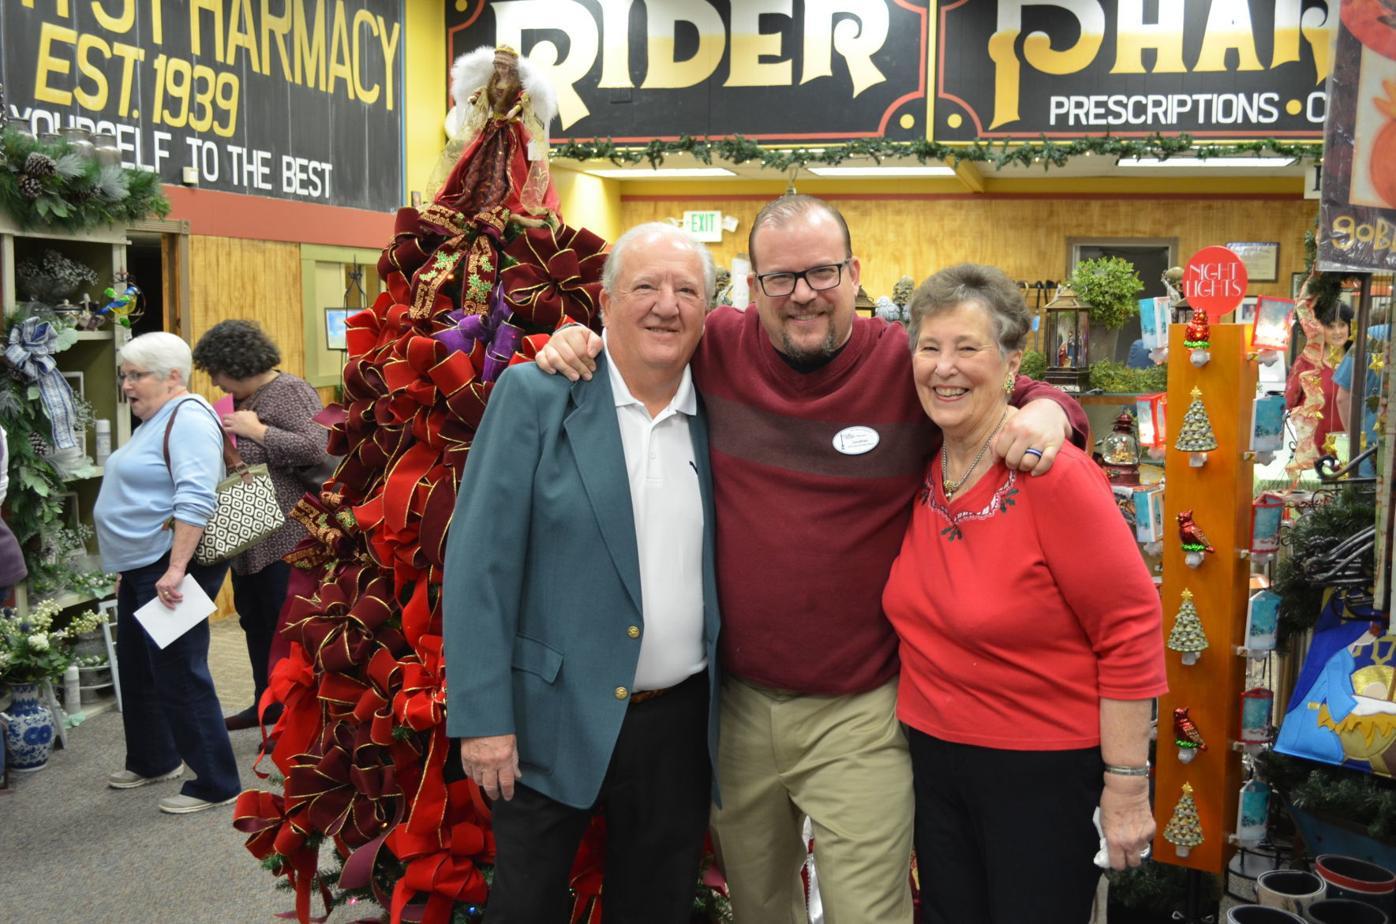 Dan, Jonathan and Barbara Rider